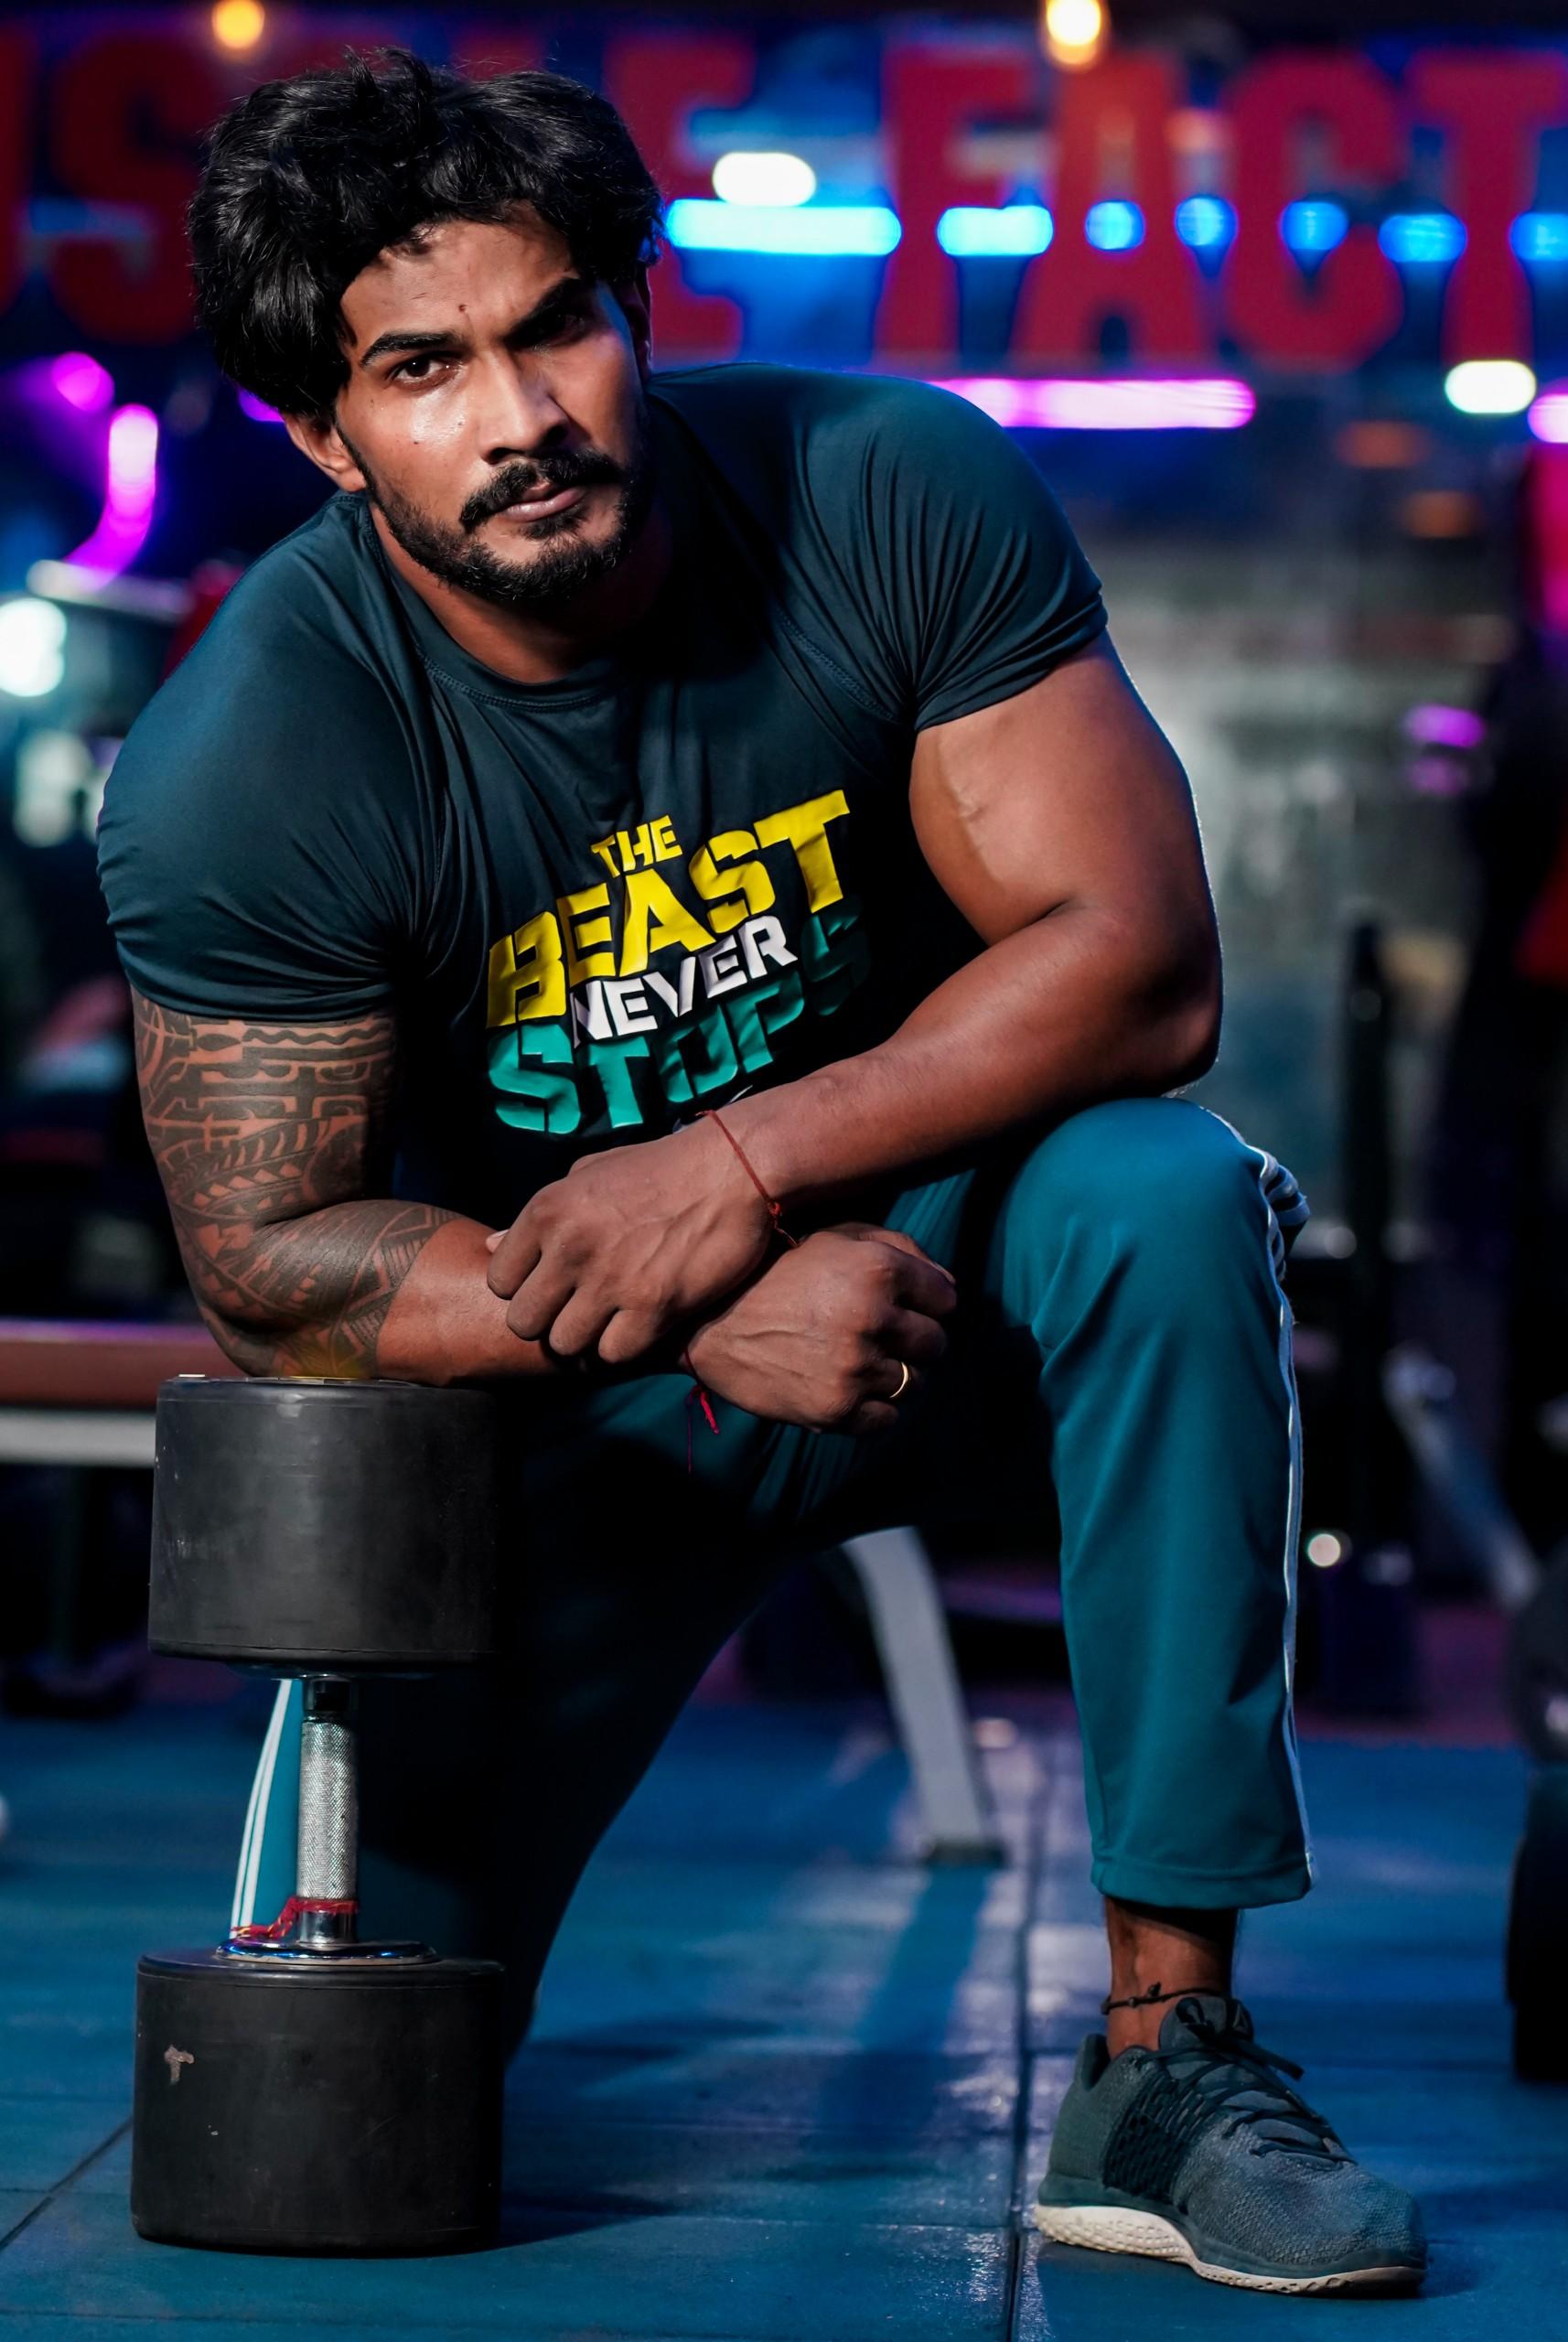 Bodybuilder posing with dumbbell